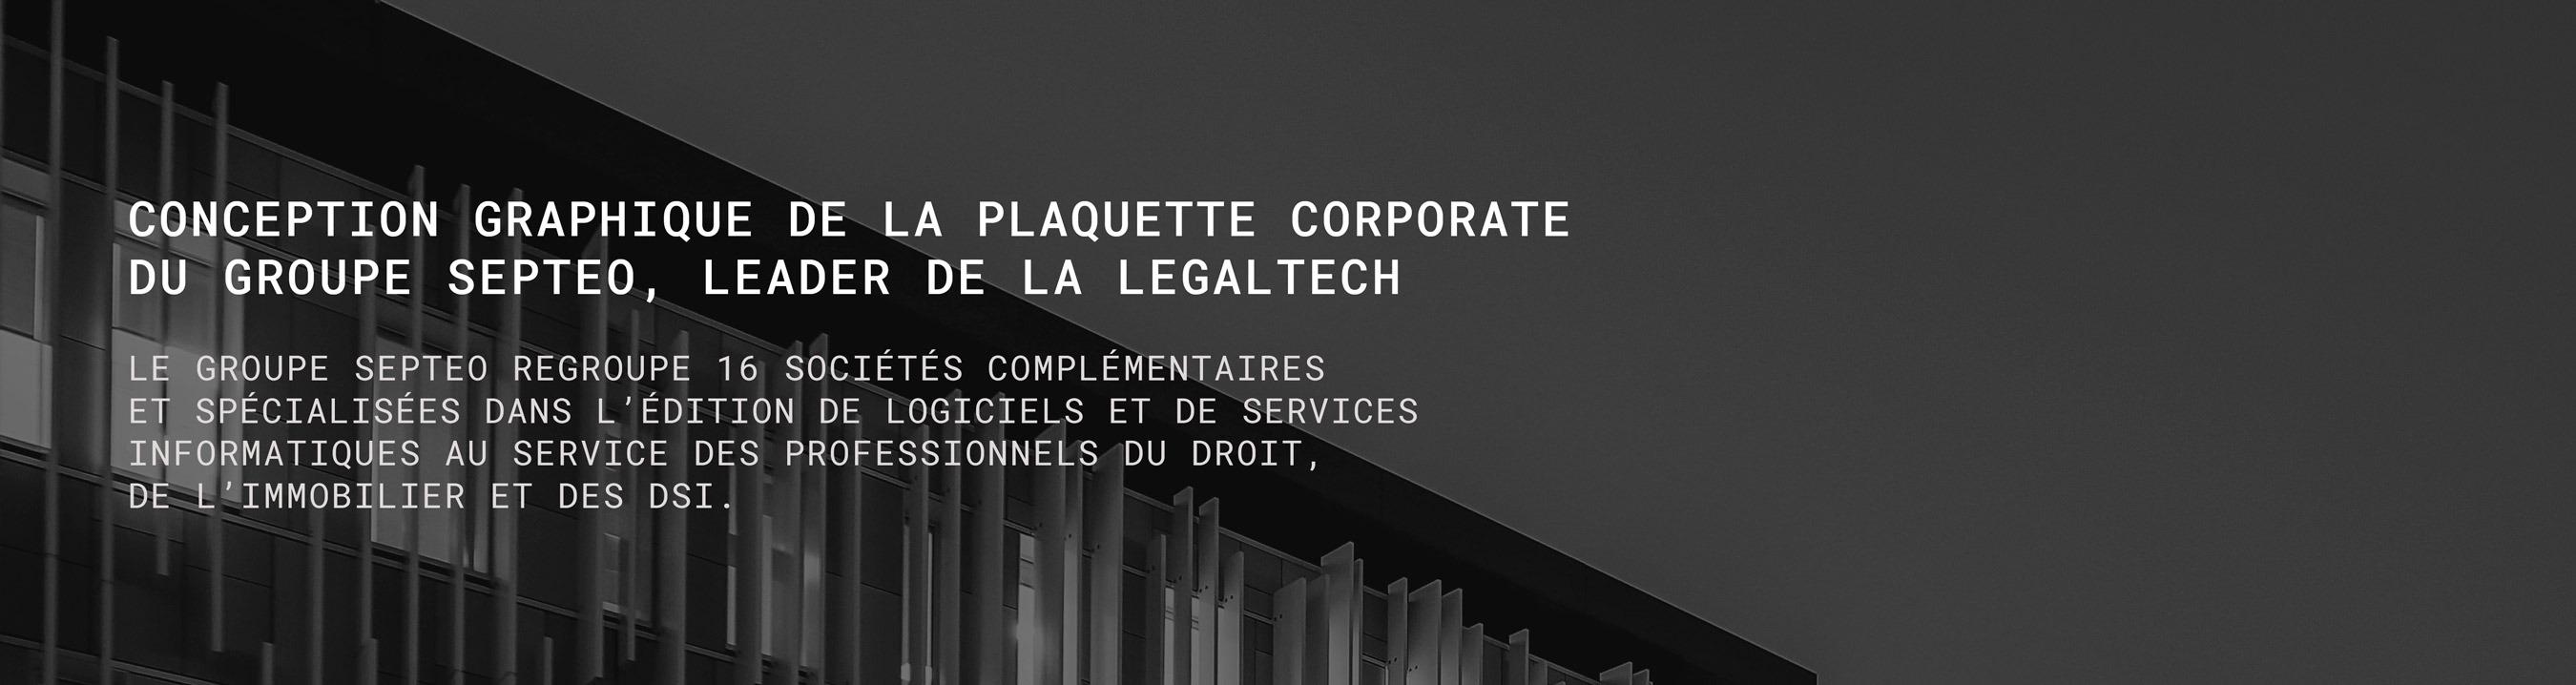 Plaquette corporate Septeo 1